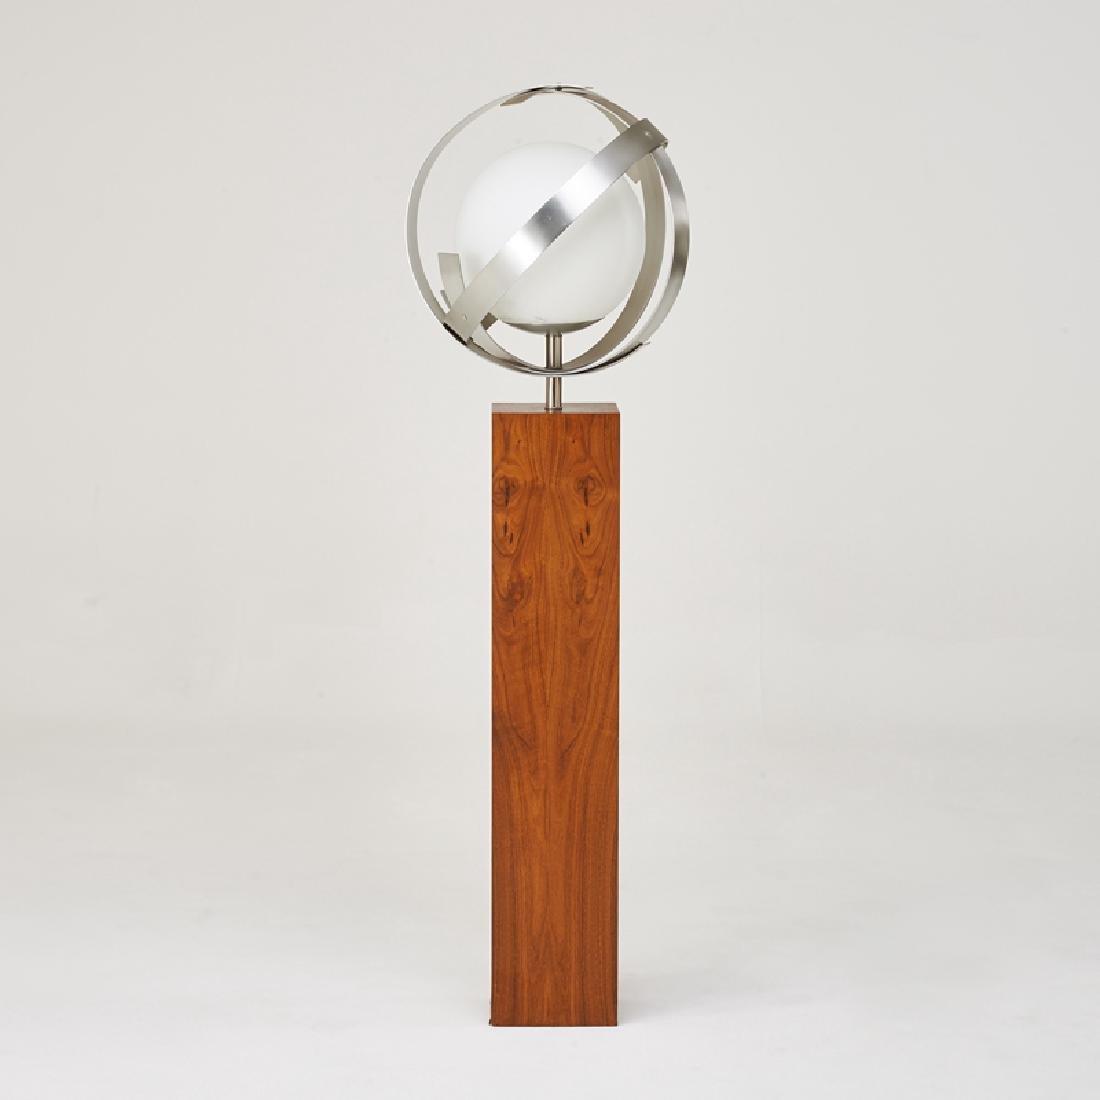 LAUREL LAMP CO.